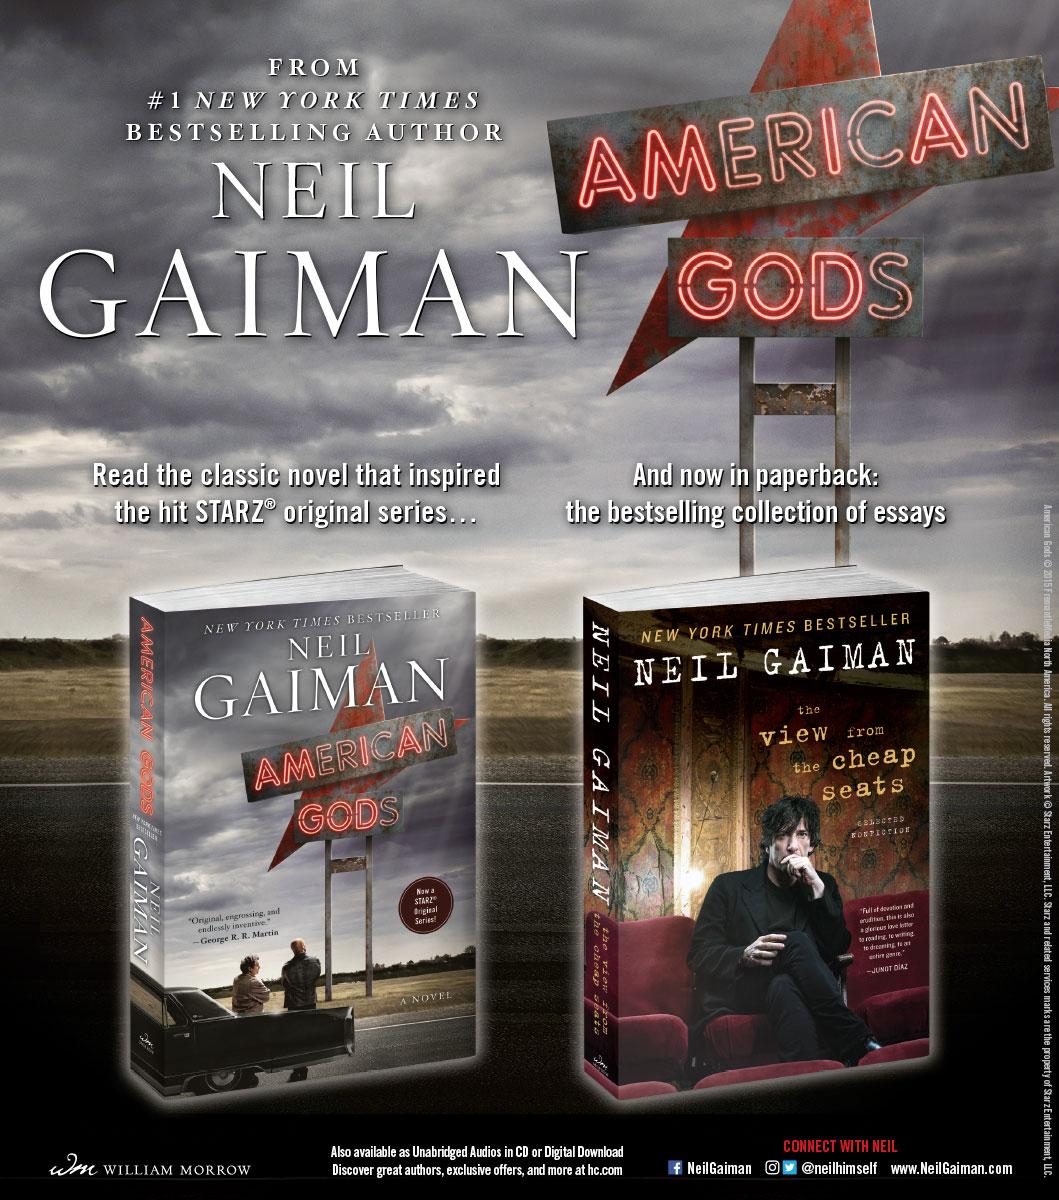 Neil Gaiman - American Gods - NYTBR